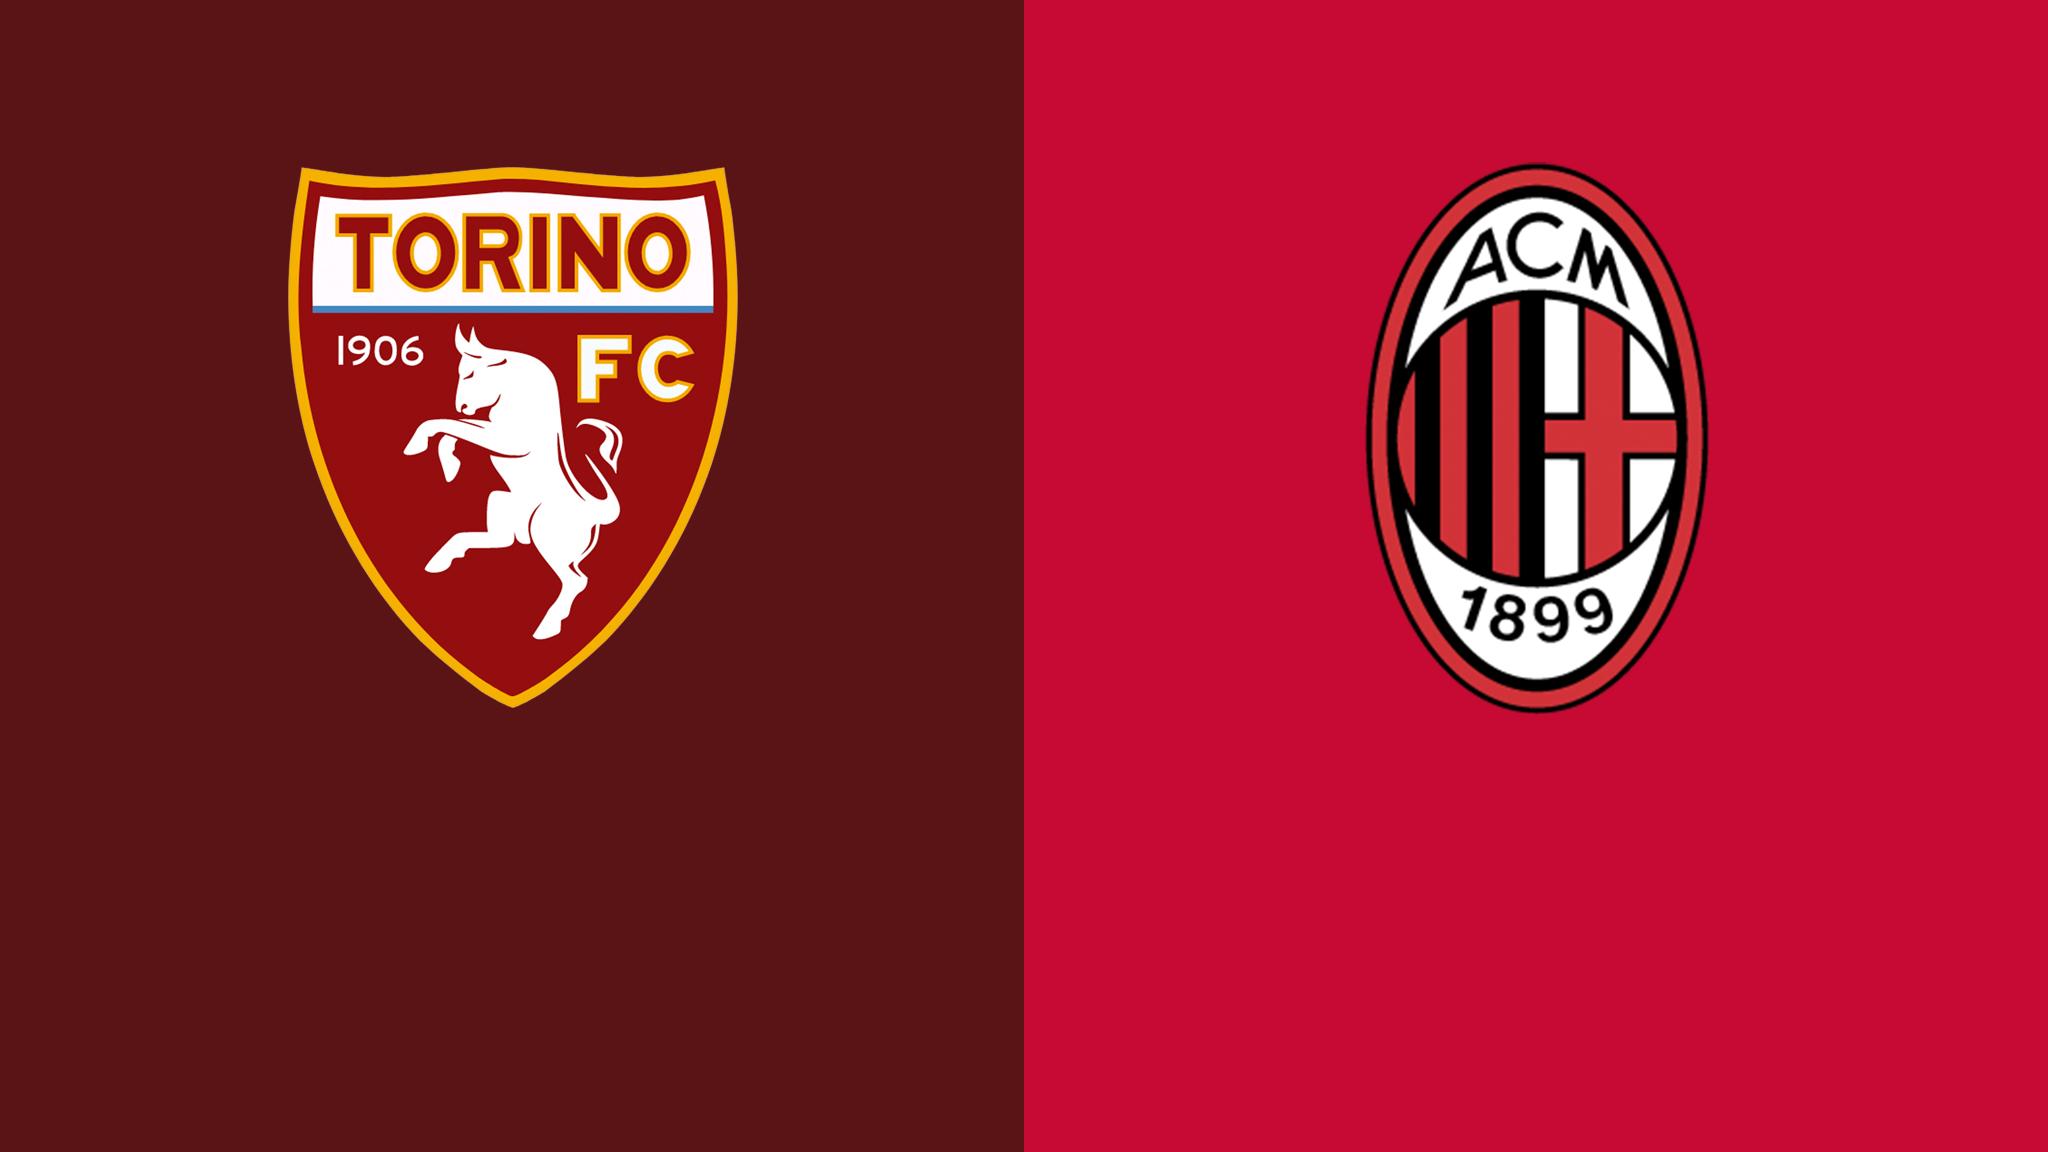 Milan vs Torino Preview & Live Streaming